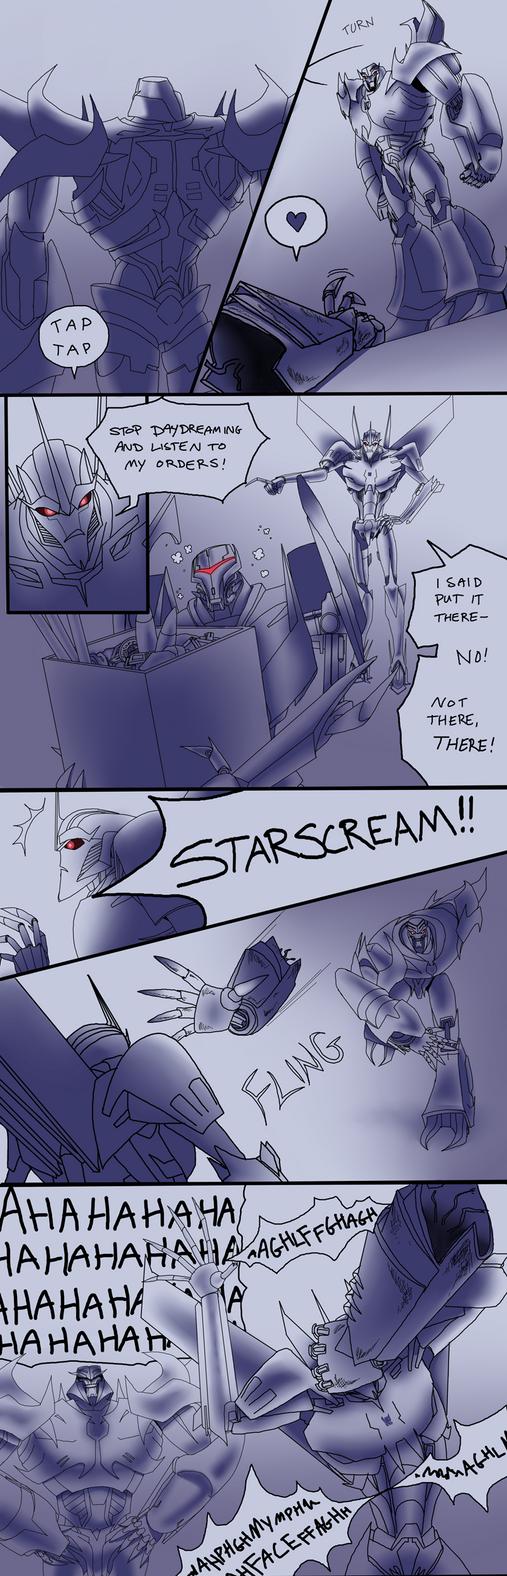 50 nuances de Starscream Megatroll_by_just_nuts-d45pp0n